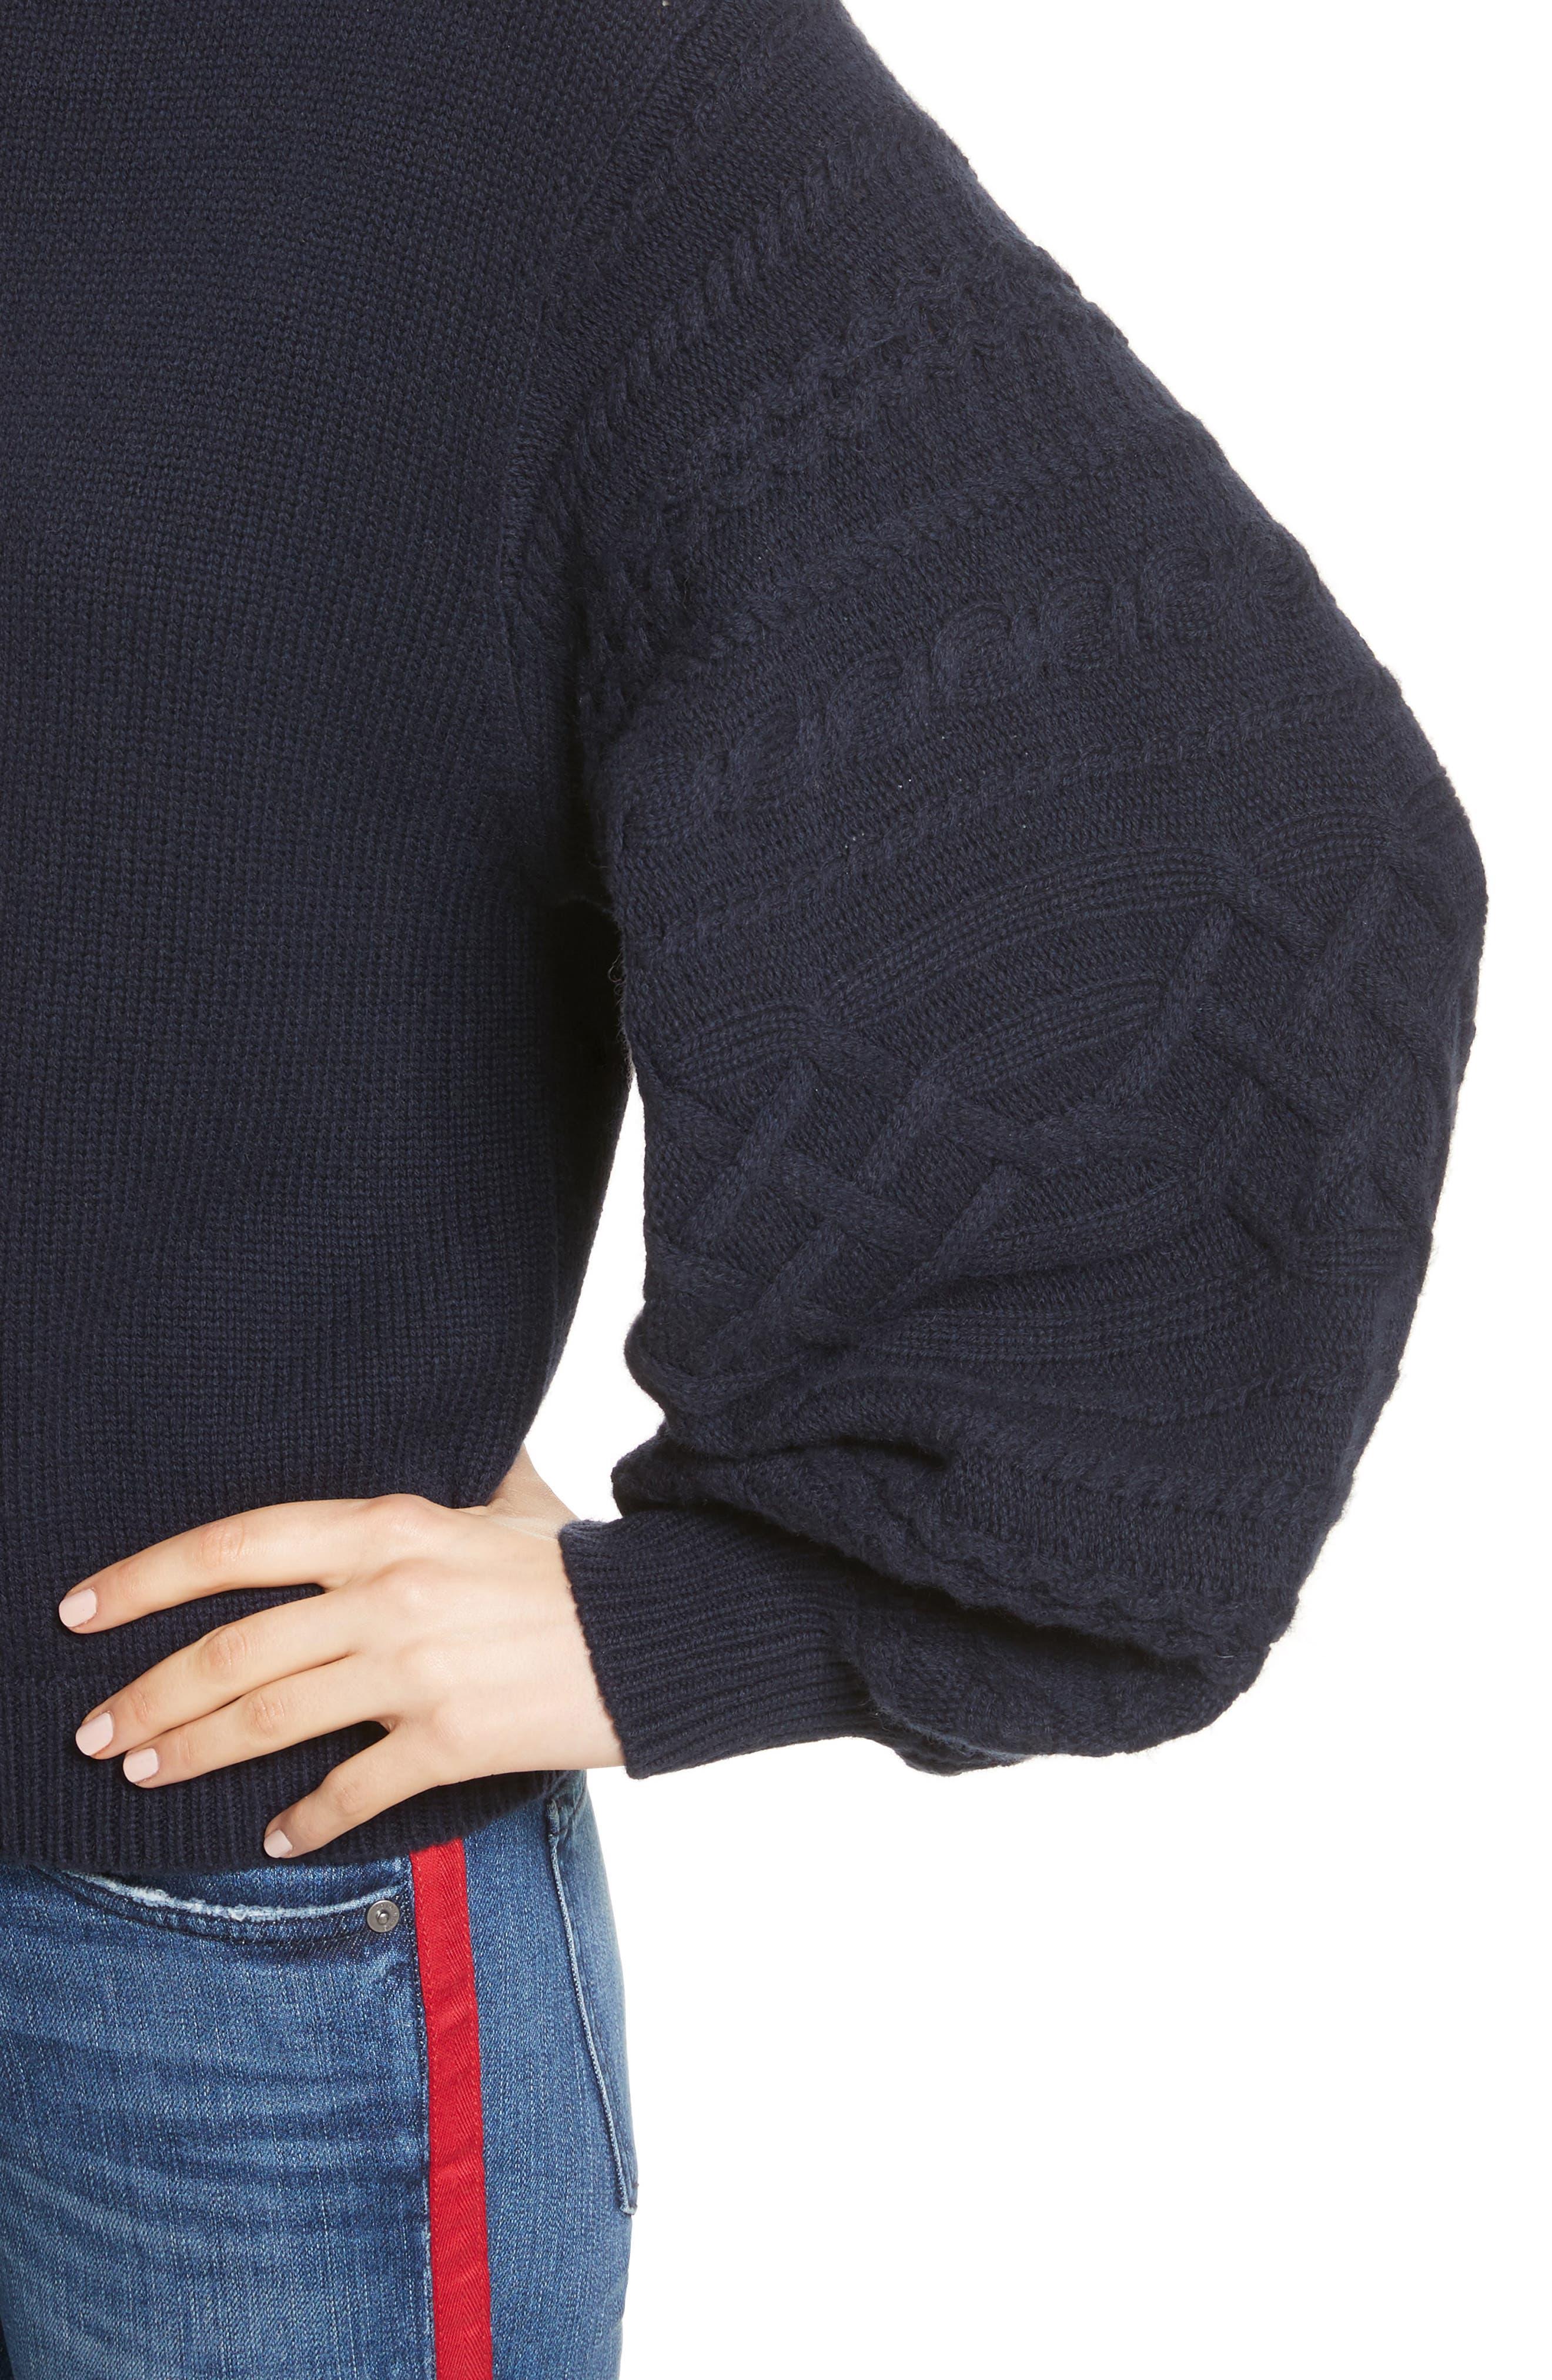 Lathen Mock Neck Sweater,                             Alternate thumbnail 4, color,                             Midnight